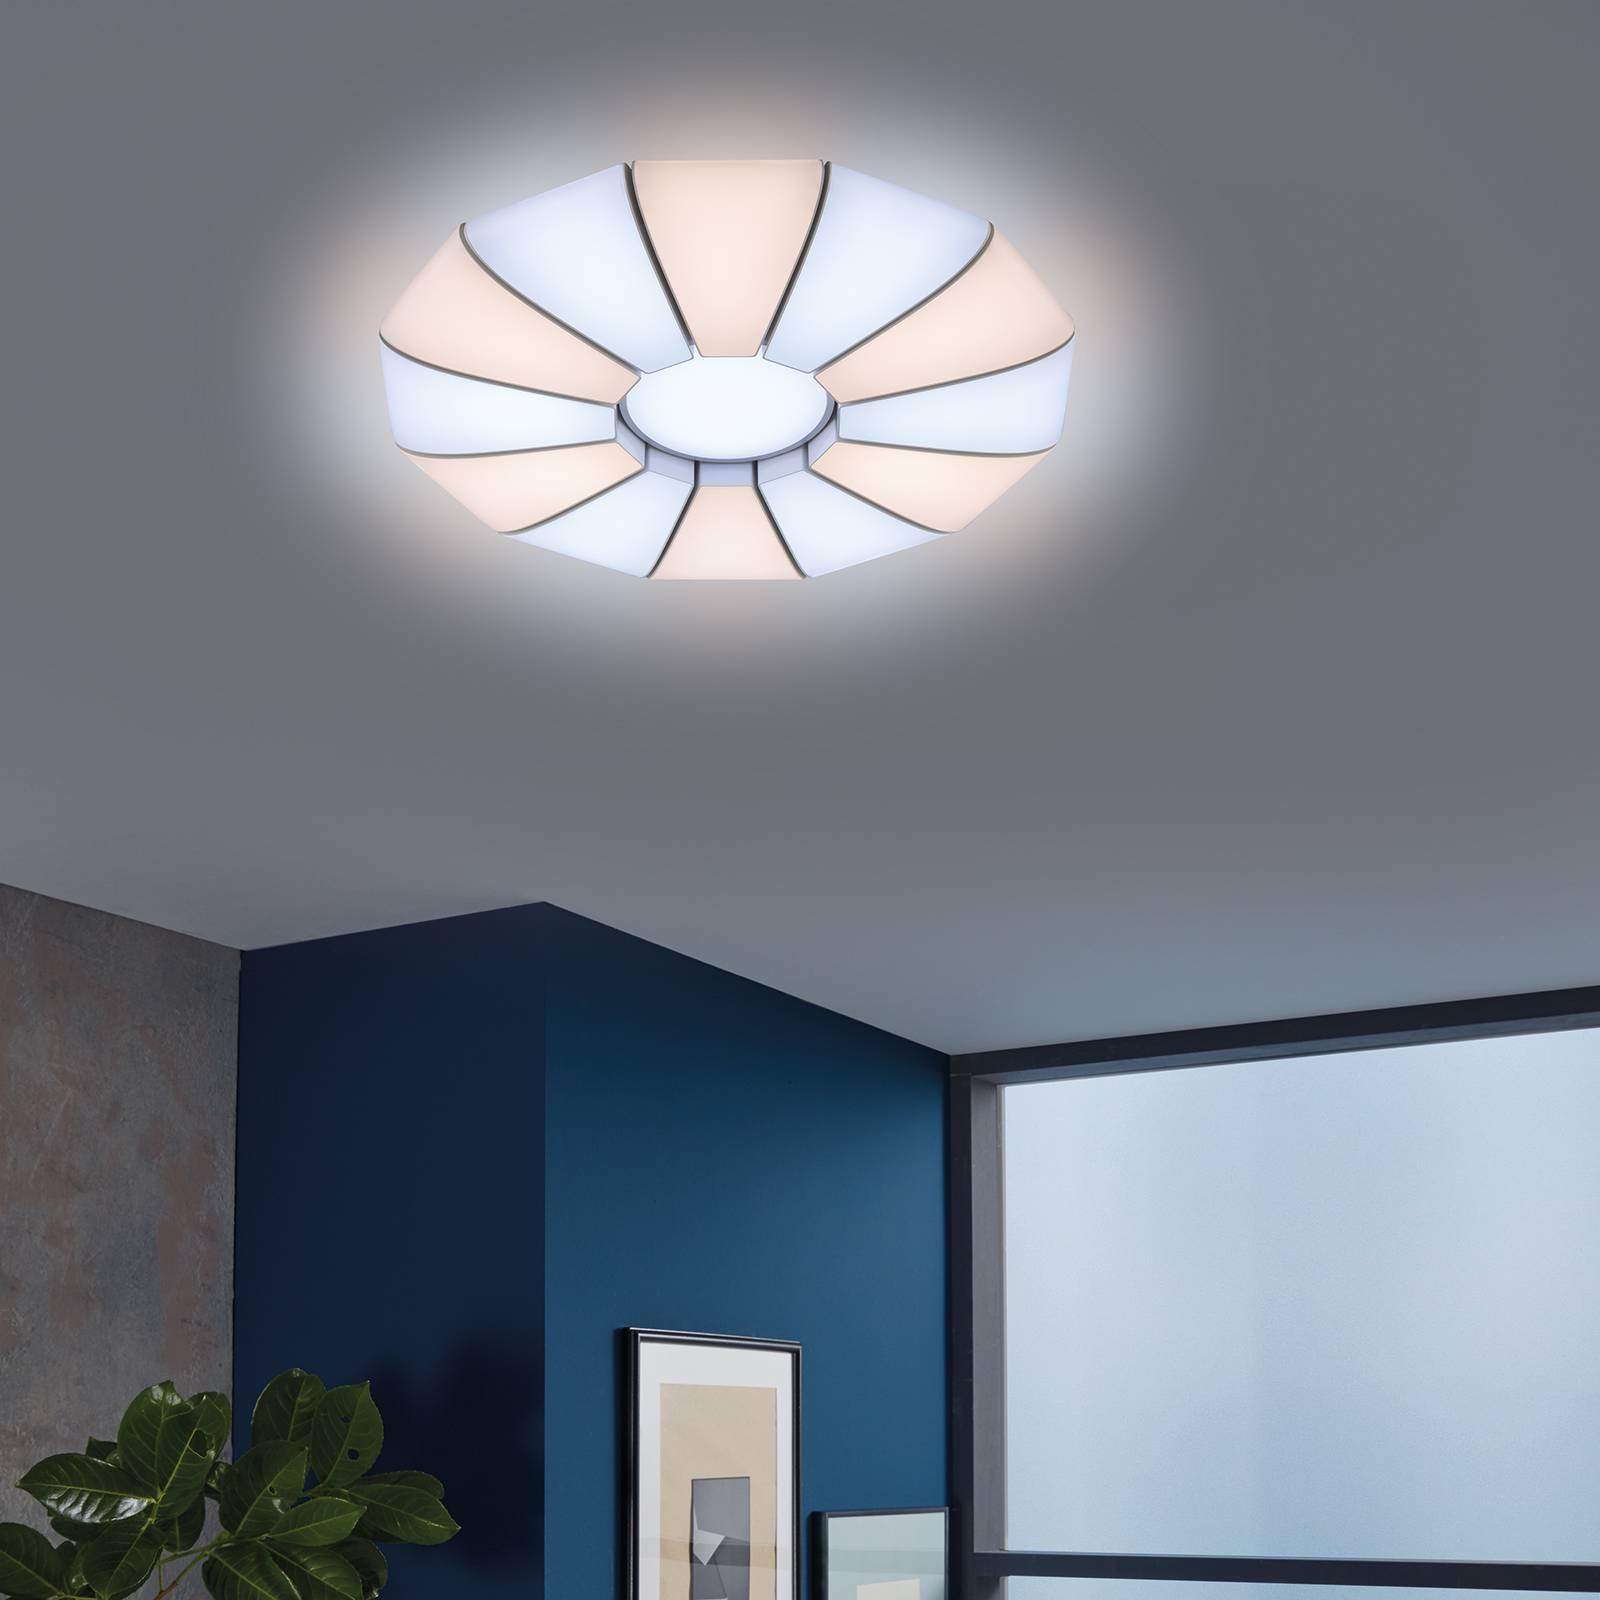 LED plafondlamp Roger tunable white